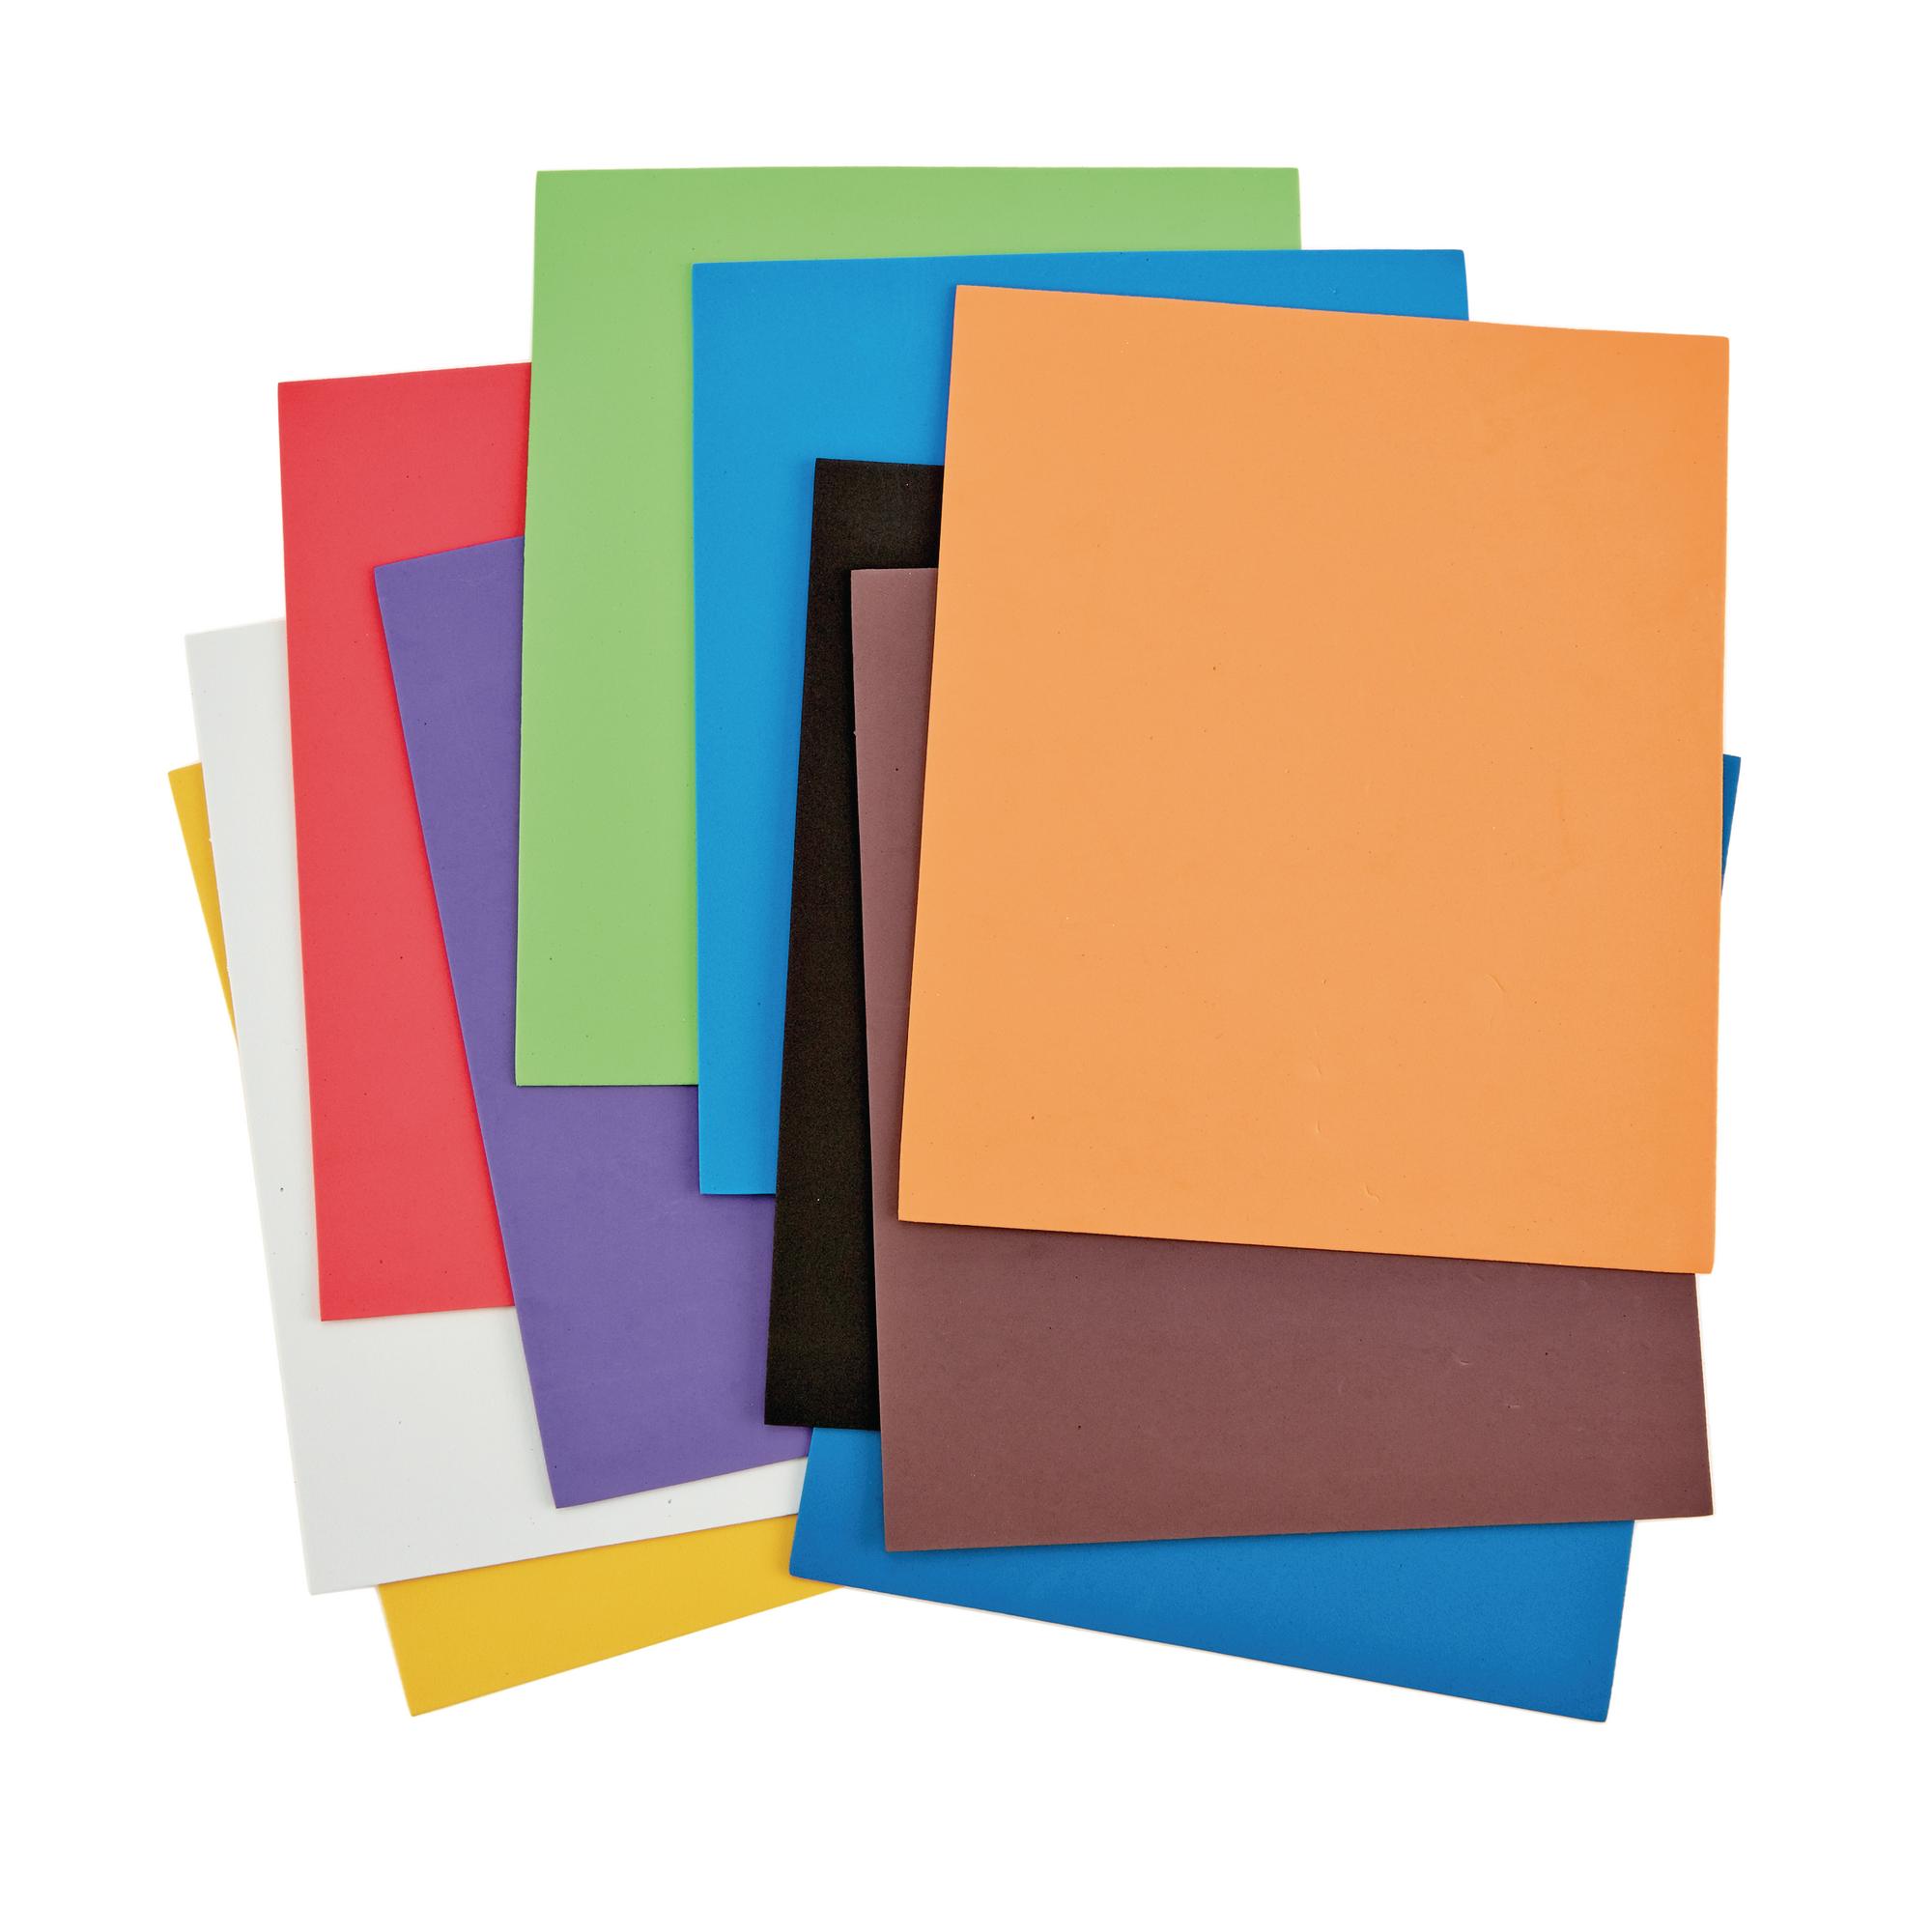 Neoprene craft foam sheets pack of 10 findel international for Soft foam sheets craft